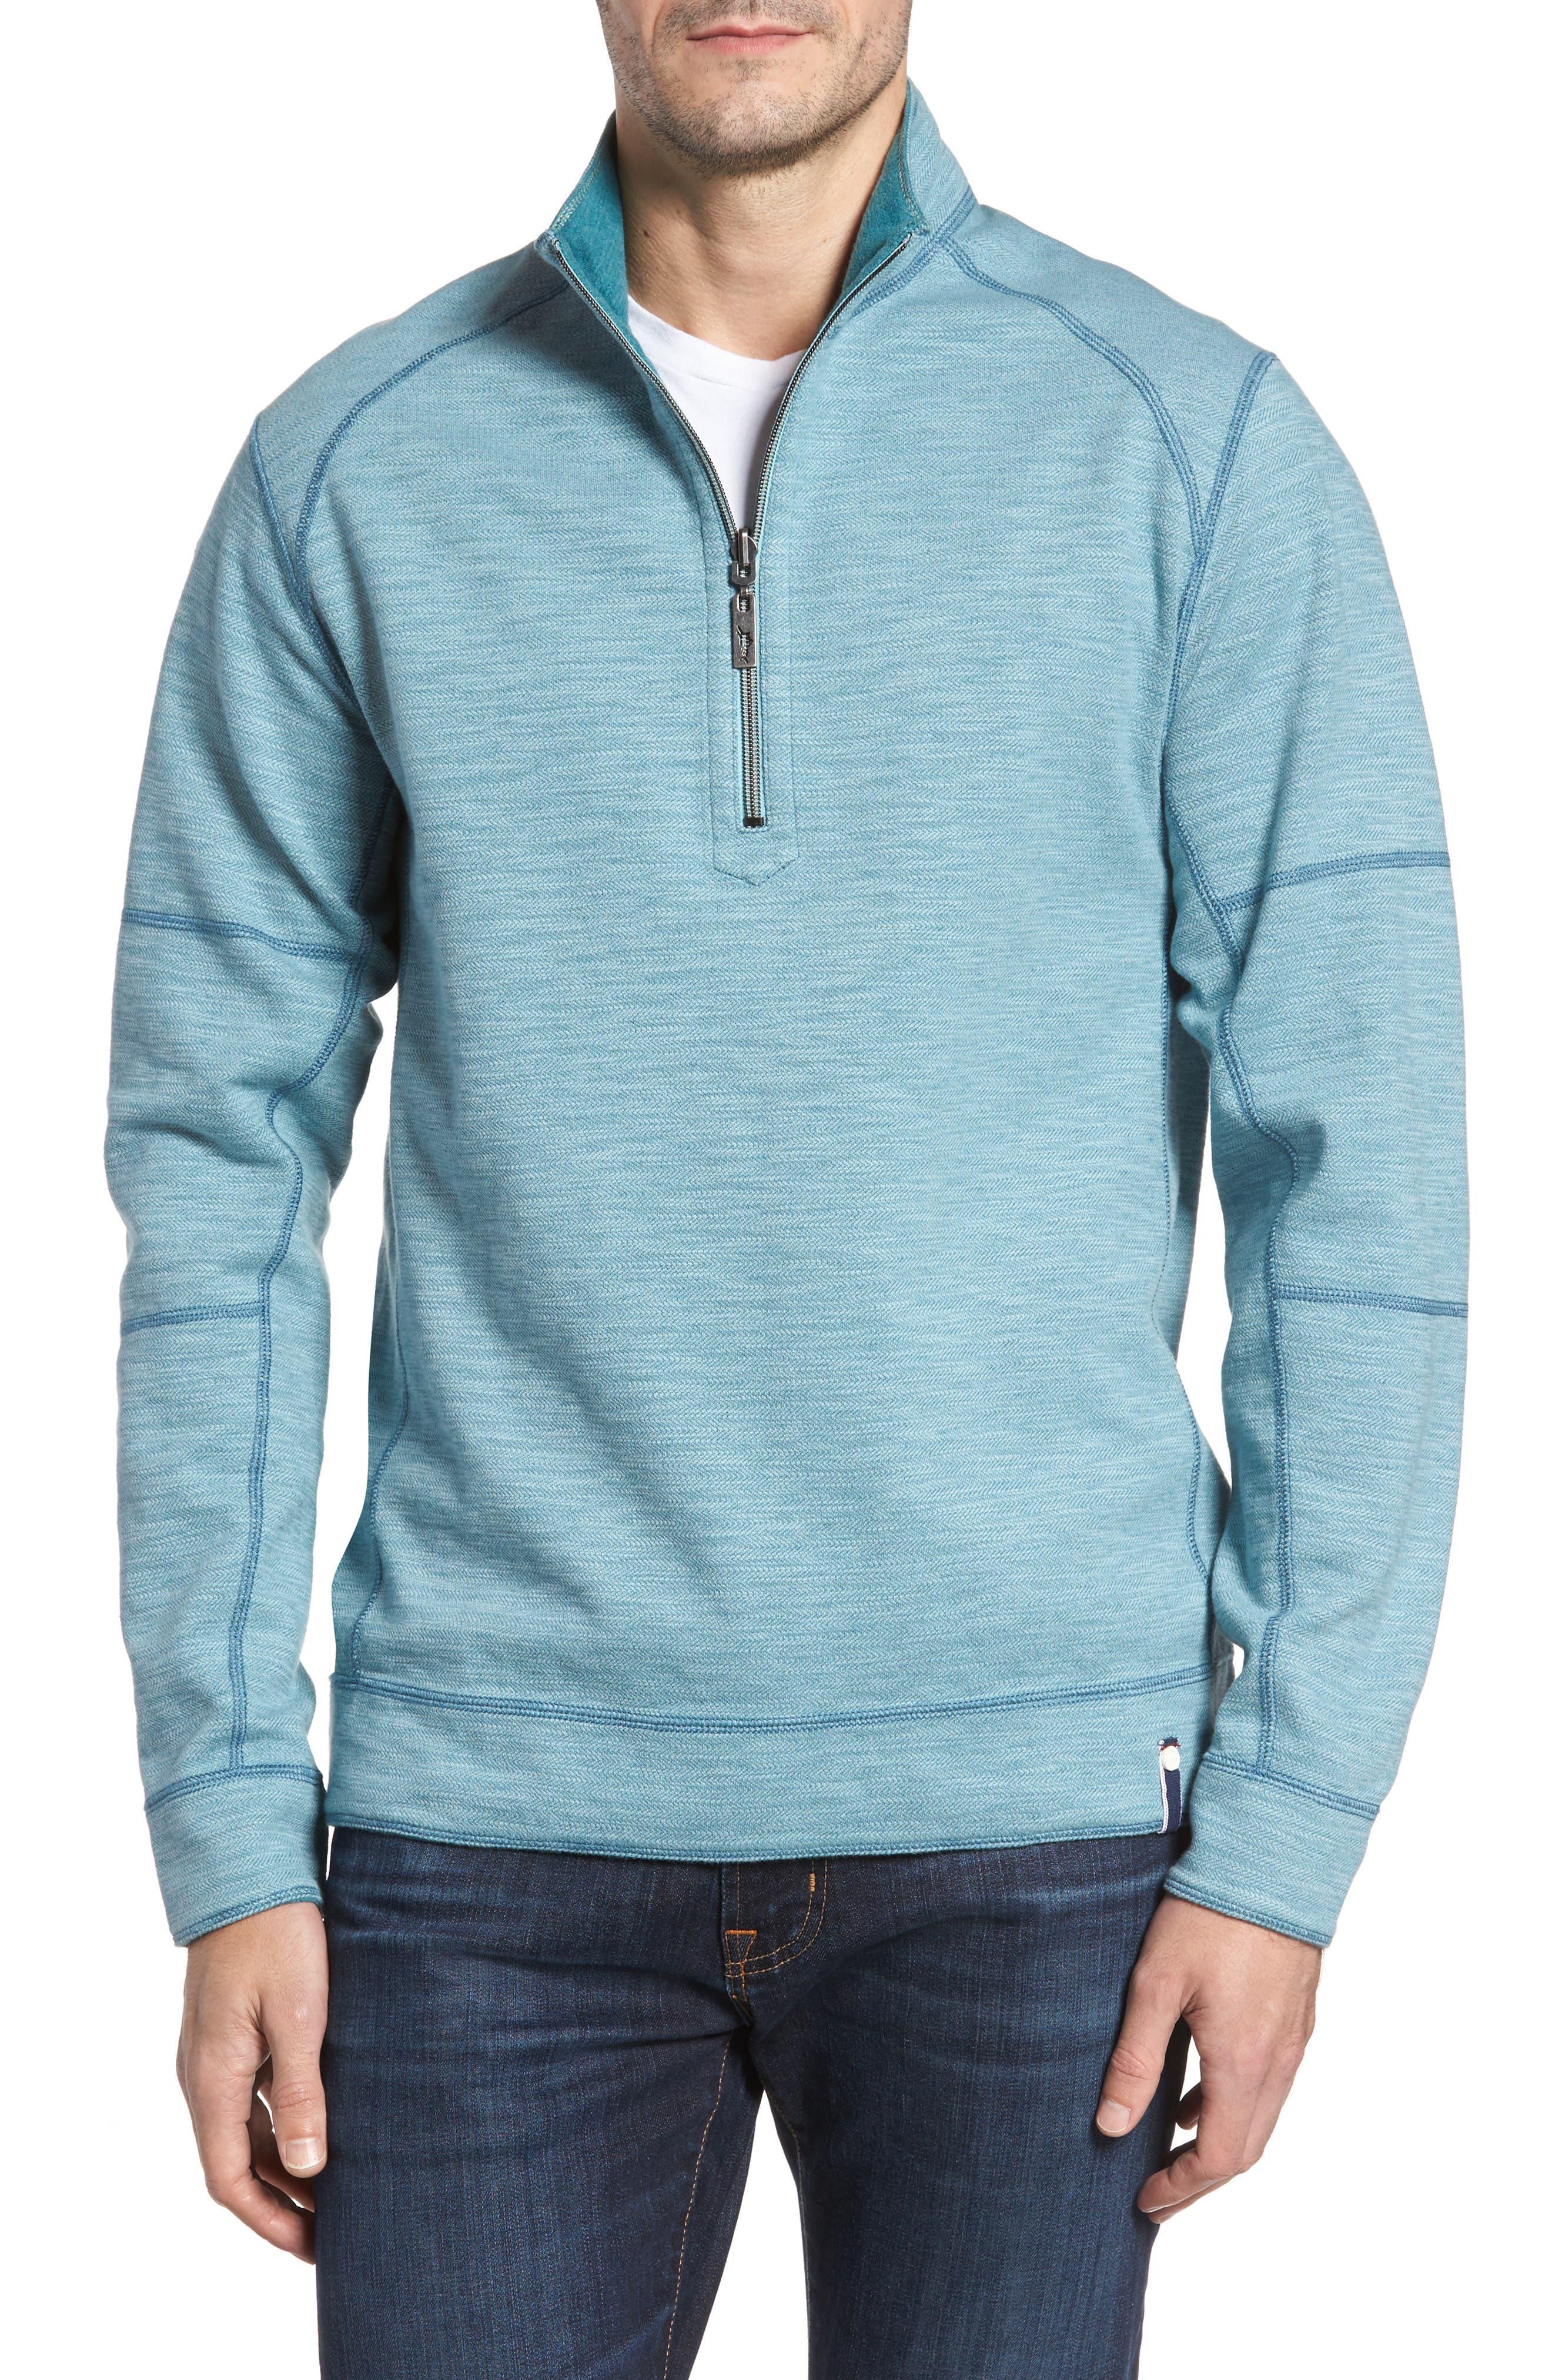 Main Image - Tommy Bahama Sandbar Slub Reversible Quarter Zip Pullover